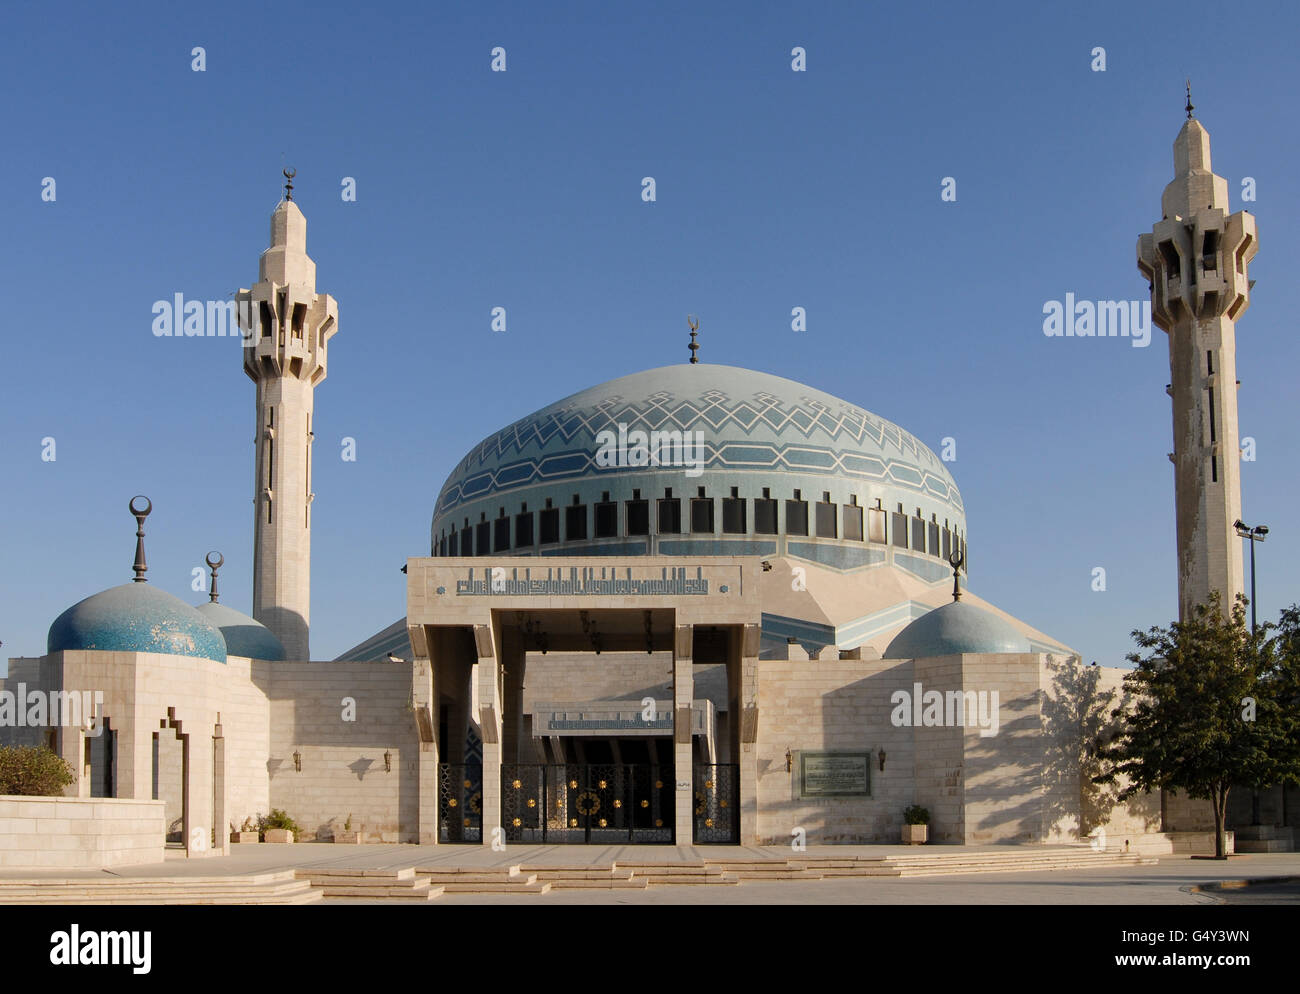 JORDAN, Amman, King I. Abdullah mosque / JORDANIEN, Amman, Koenig Abdullah Moschee - Stock Image